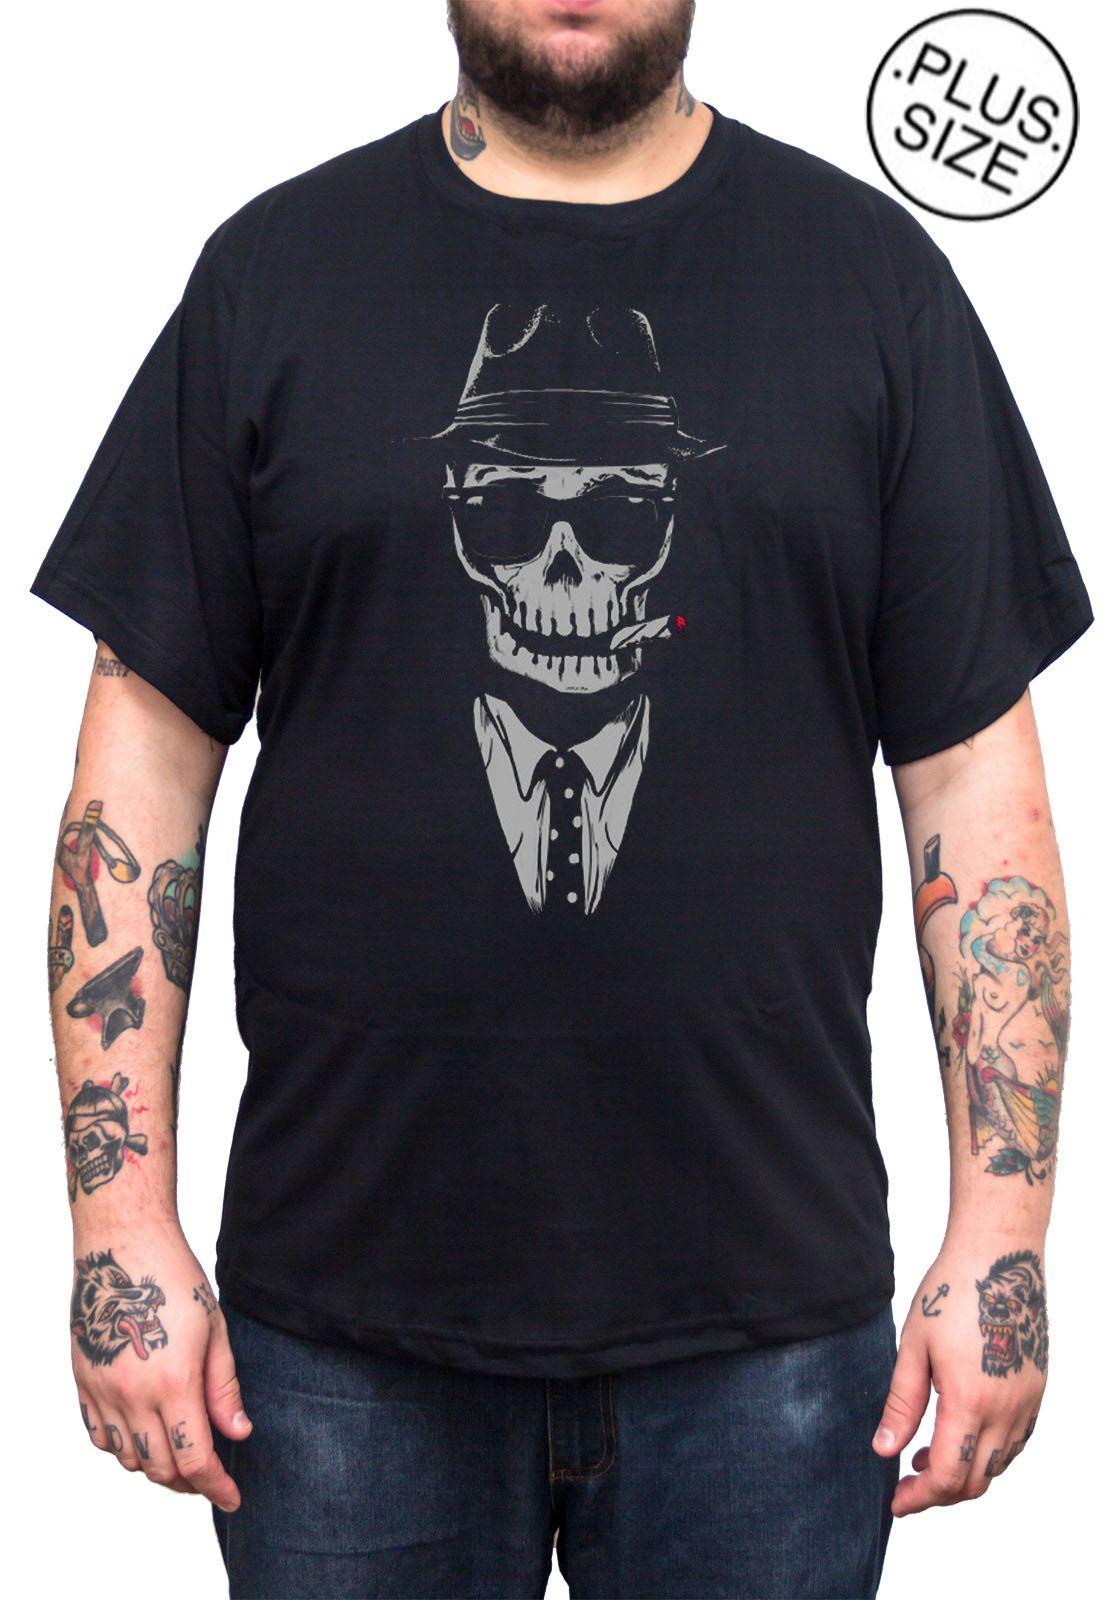 Camiseta Hshop Gangsta - Preto - Plus Size - Tamanho Grande XG  - HShop